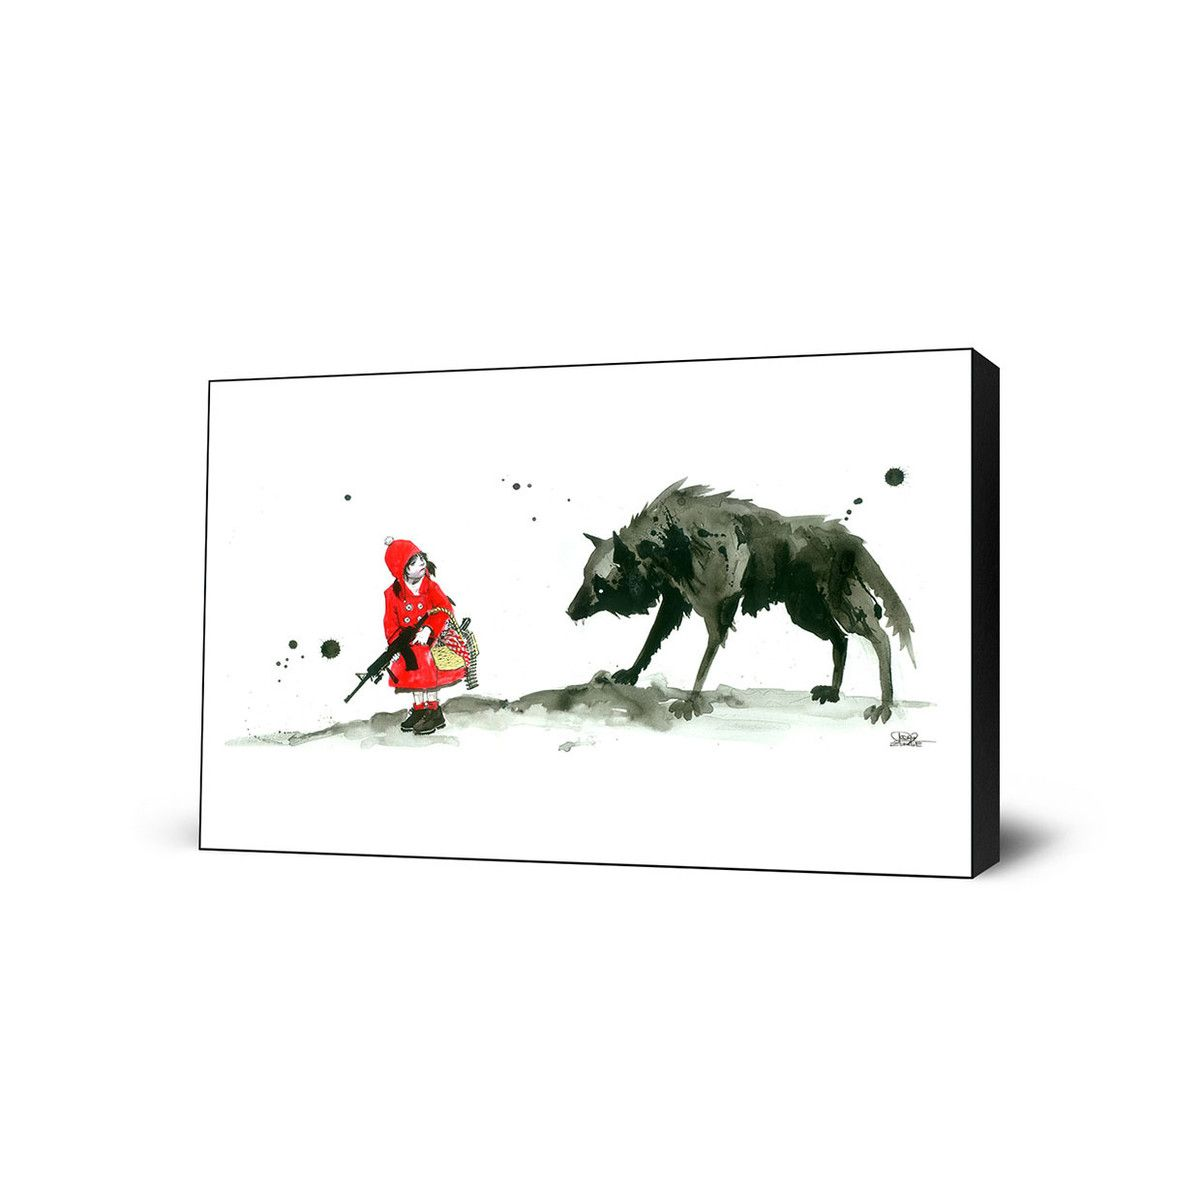 (18) Fab.com   Red Riding Hood Large Art Block